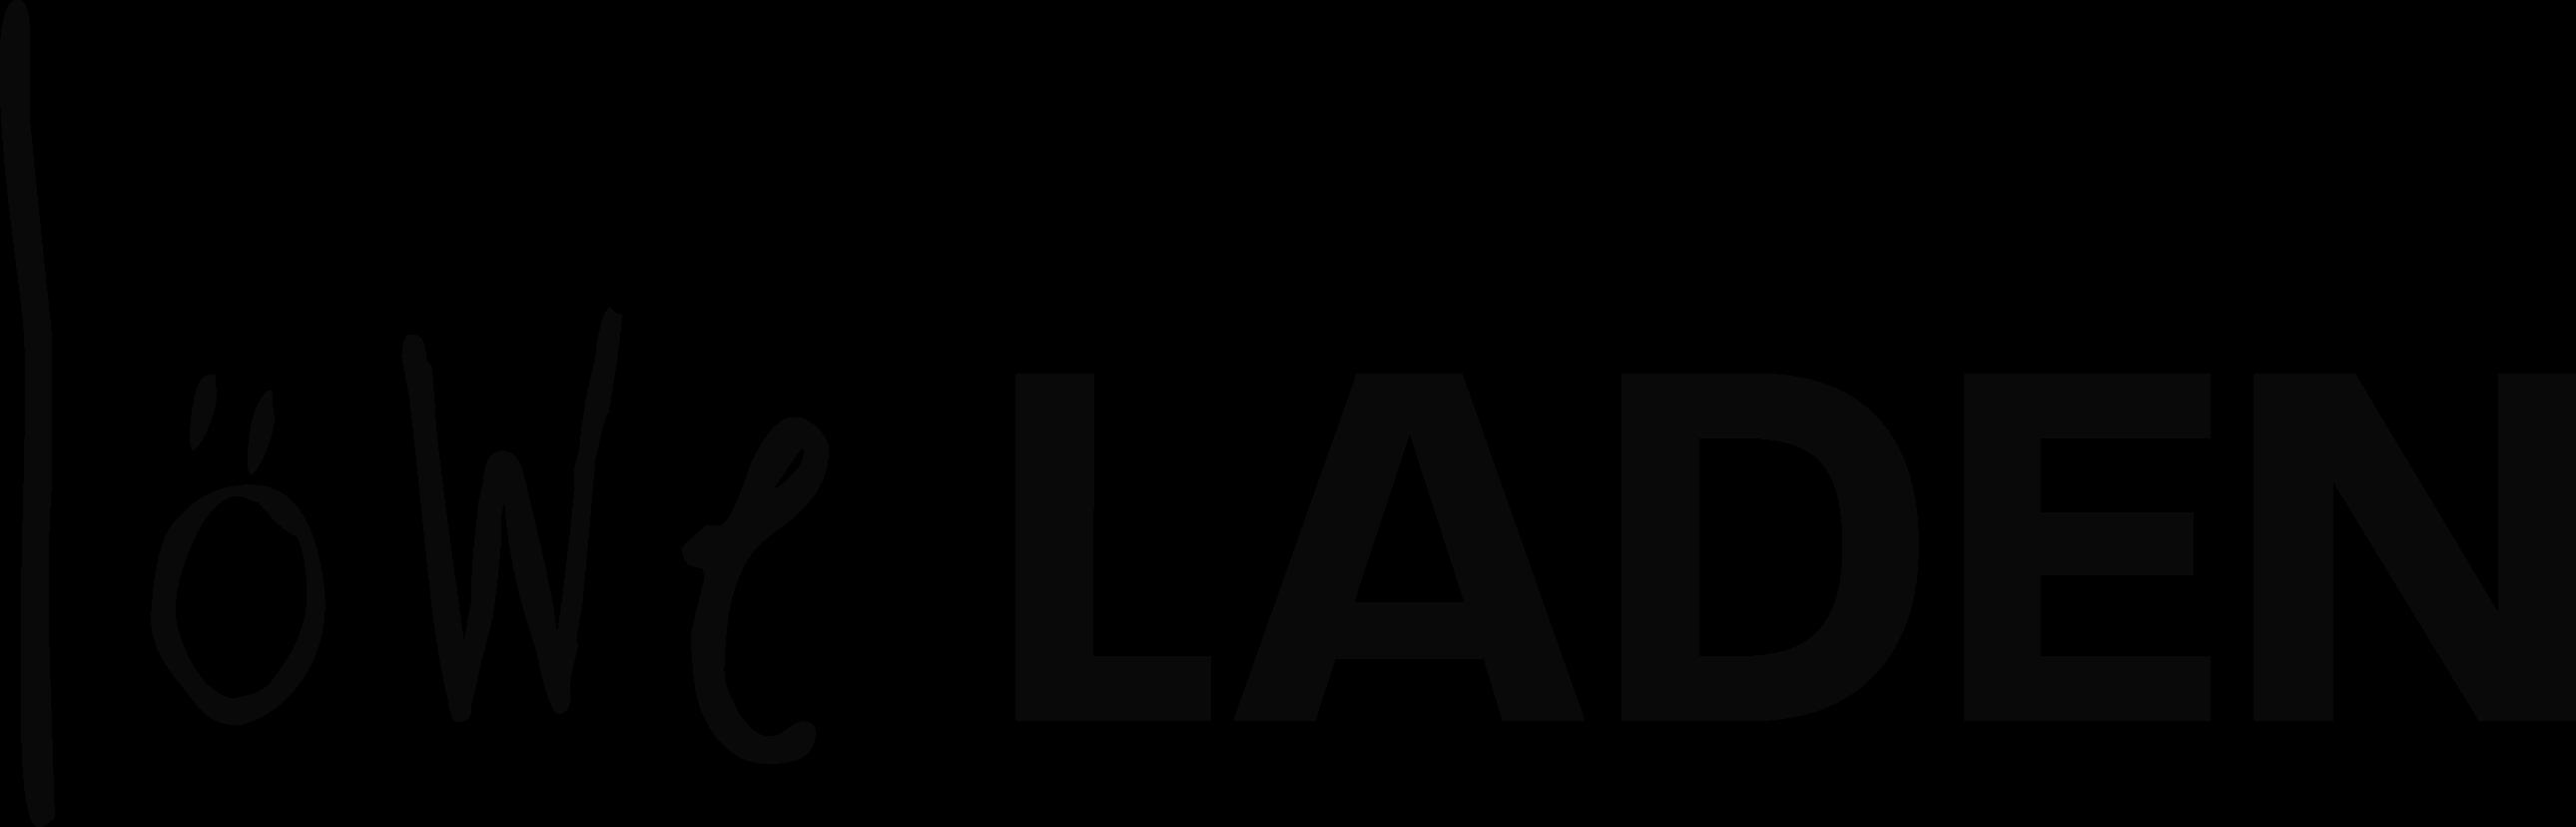 Löwe Fulda Logo